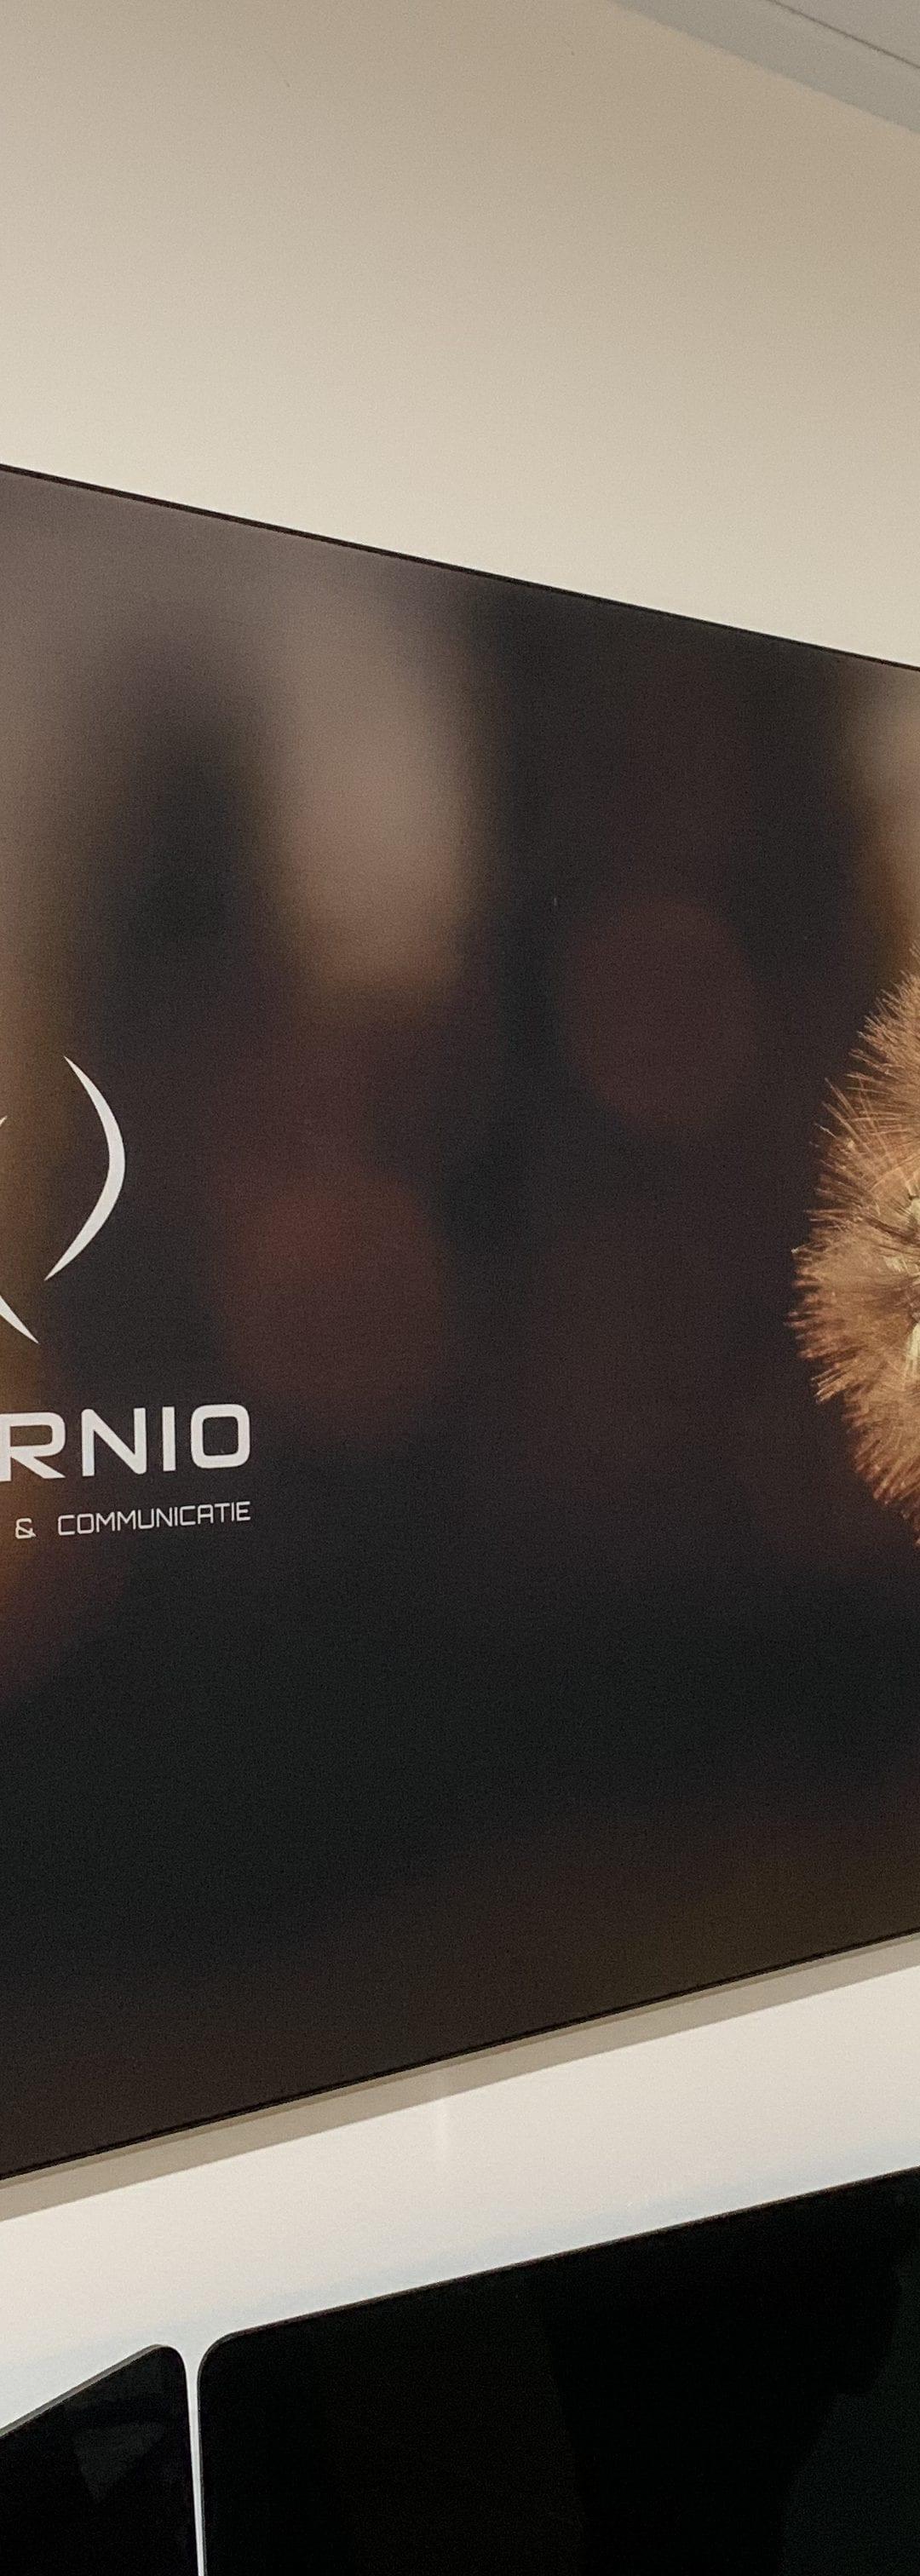 Burnio groeit en ontwikkelt